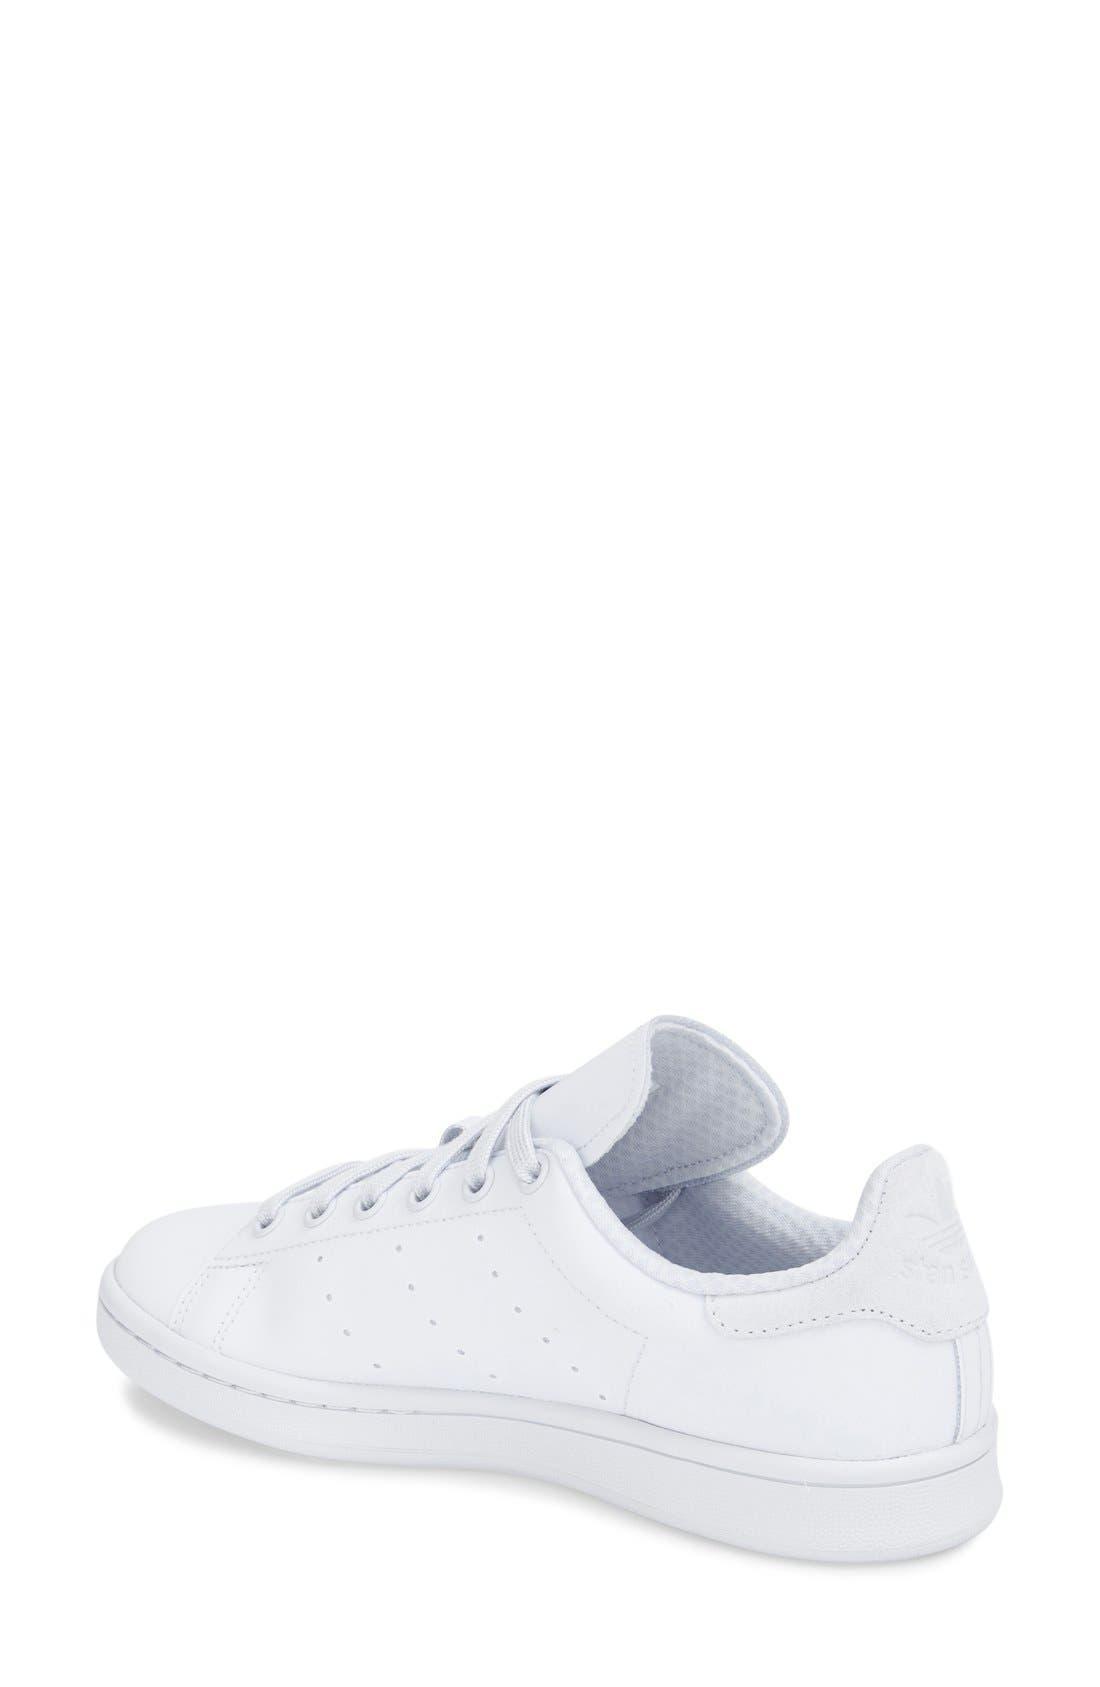 'Stan Smith' Sneaker,                             Alternate thumbnail 42, color,